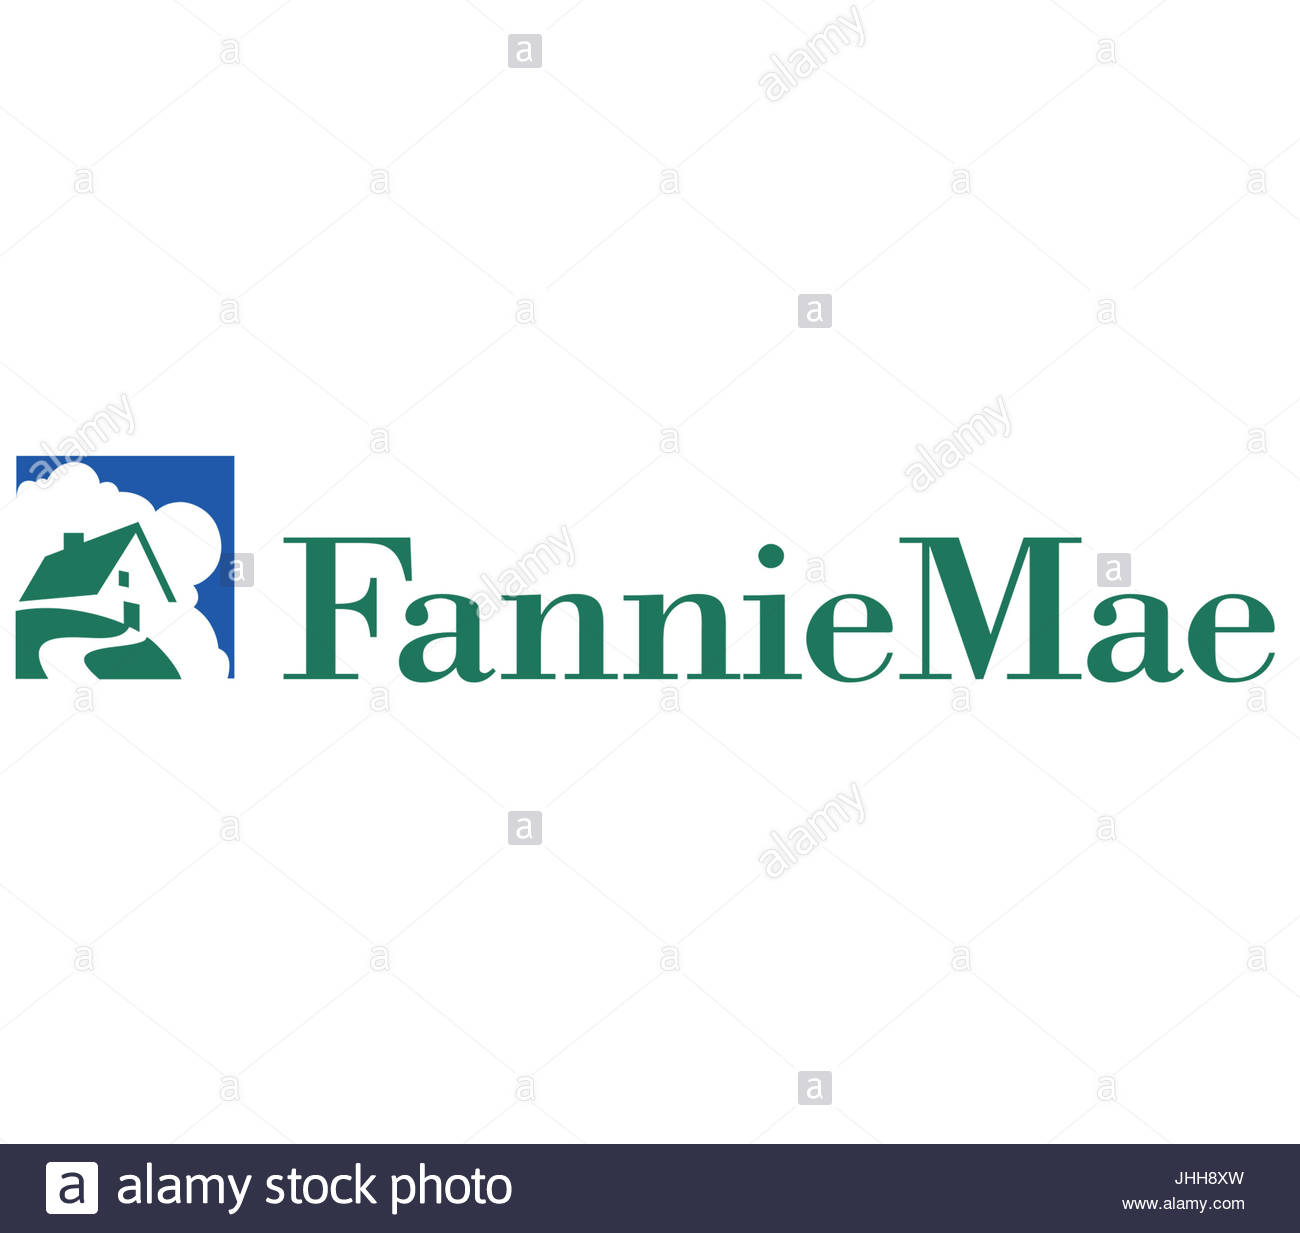 Fannie Mae logo icon - Stock Image